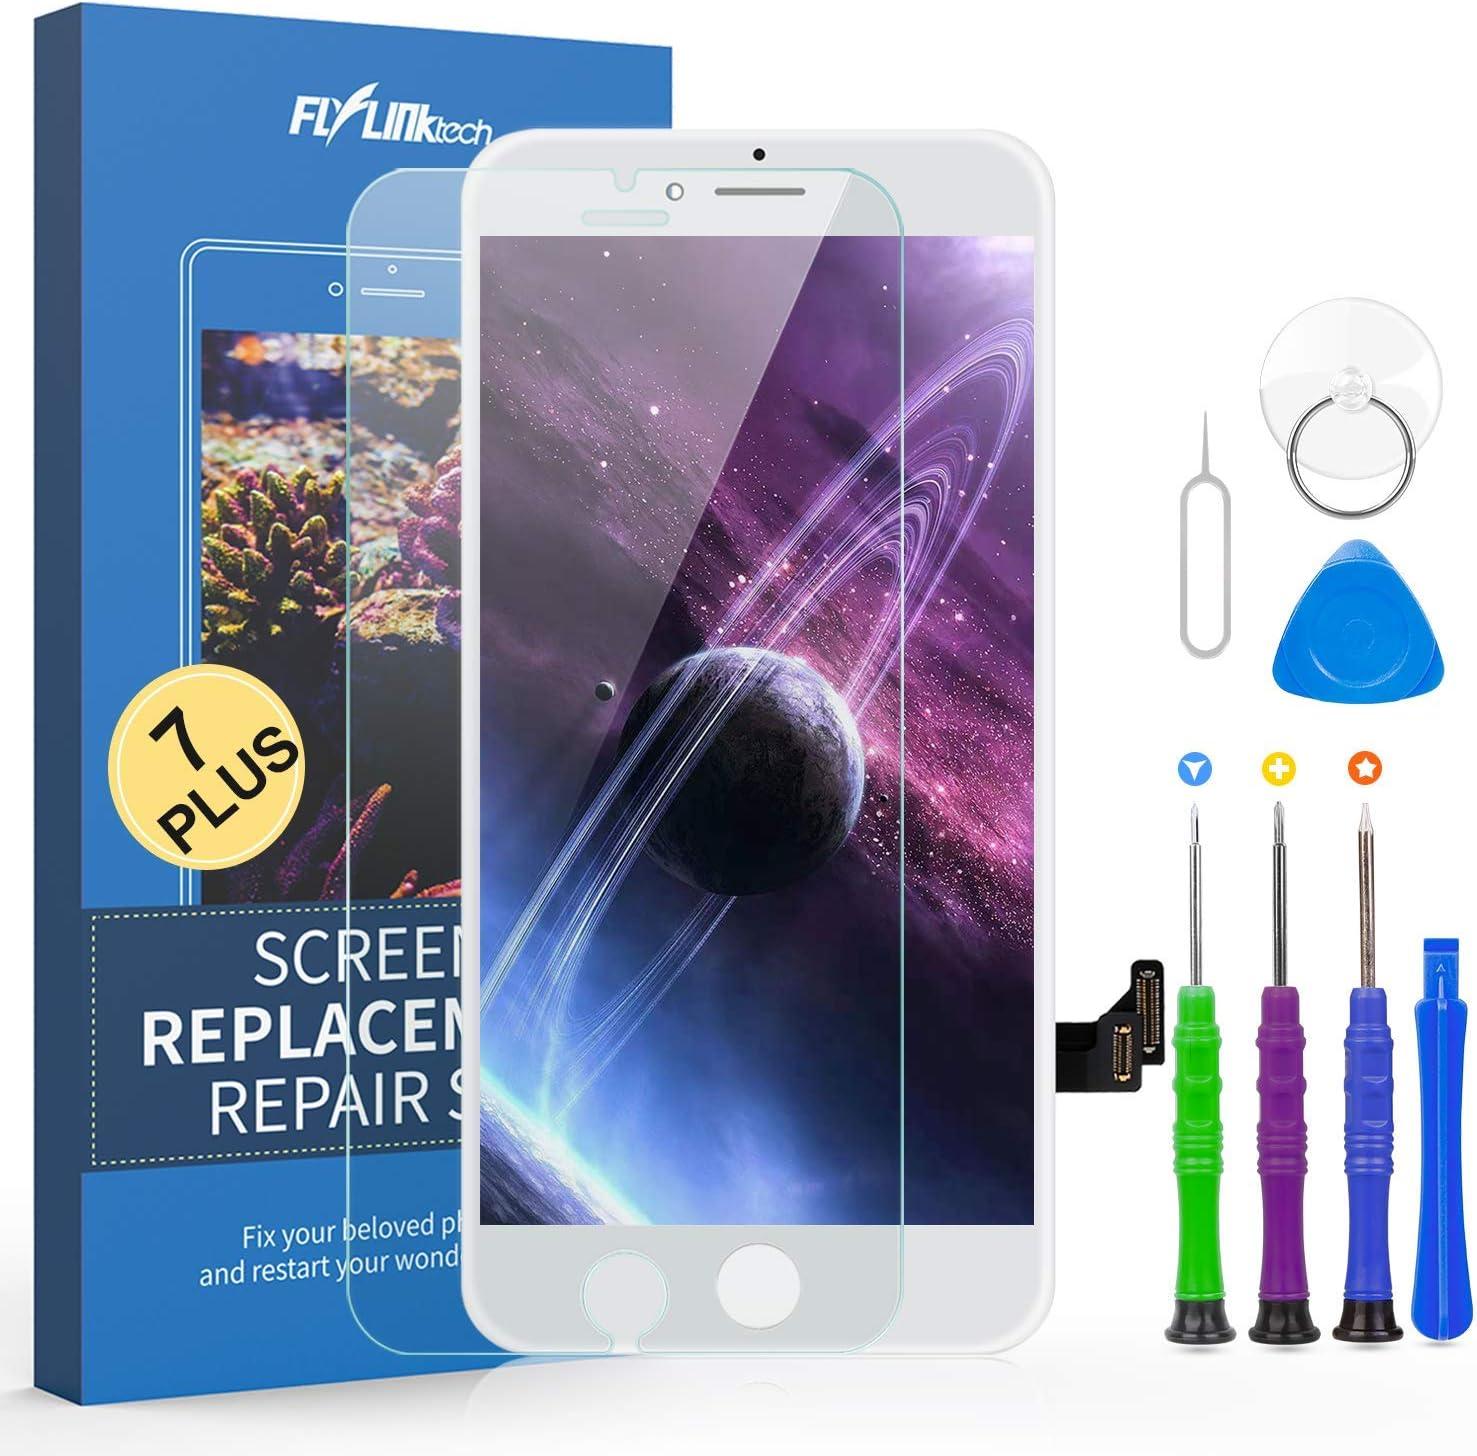 FLYLINKTECH Pantalla Táctil LCD Reemplazo para iPhone 7 Plus Blanco 5.5